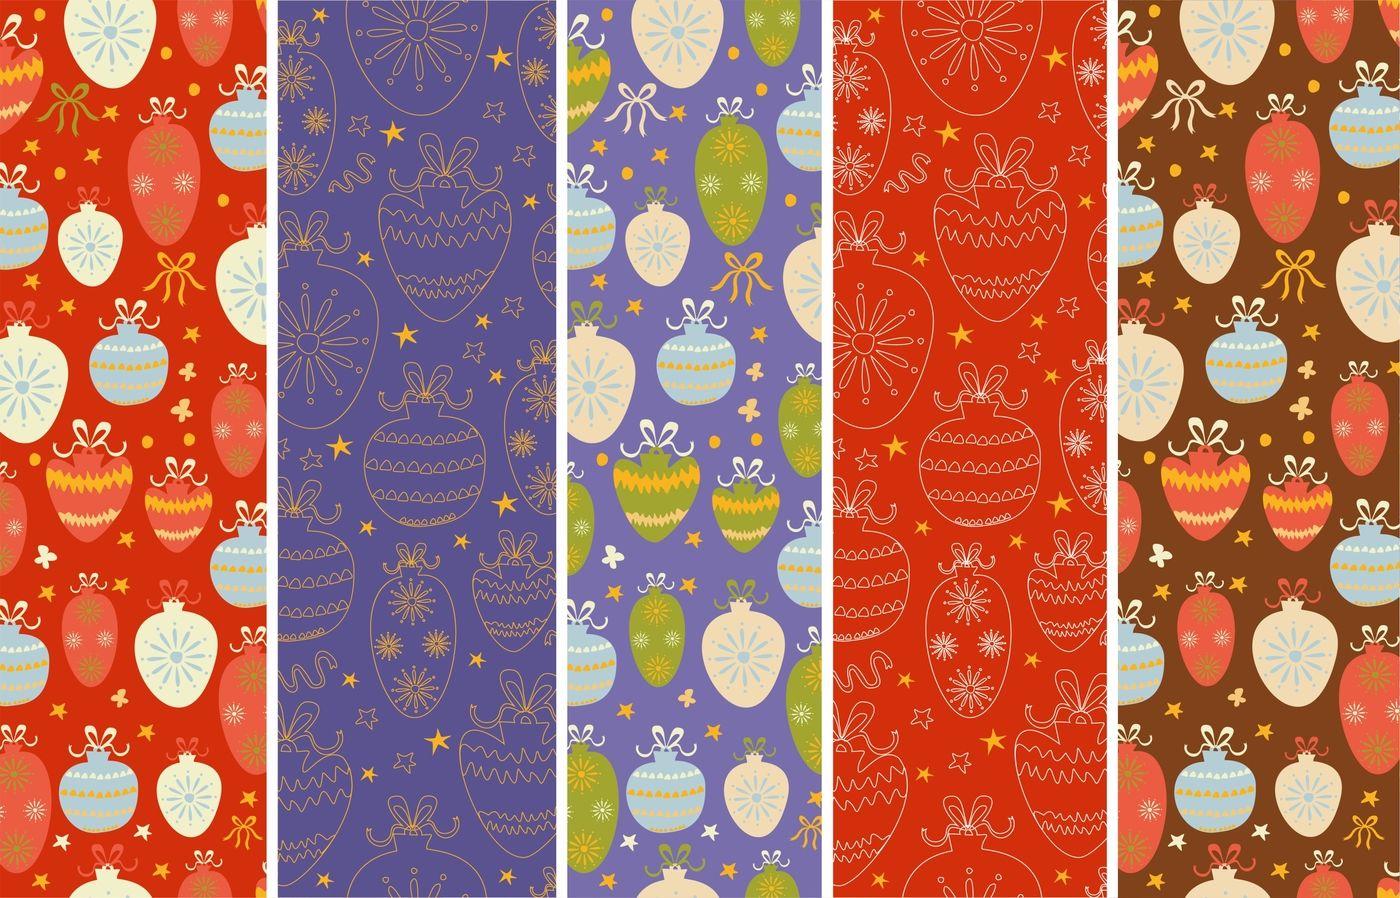 Christmas Set Wreaths Patterns By Lesya Skripak Thehungryjpeg Com